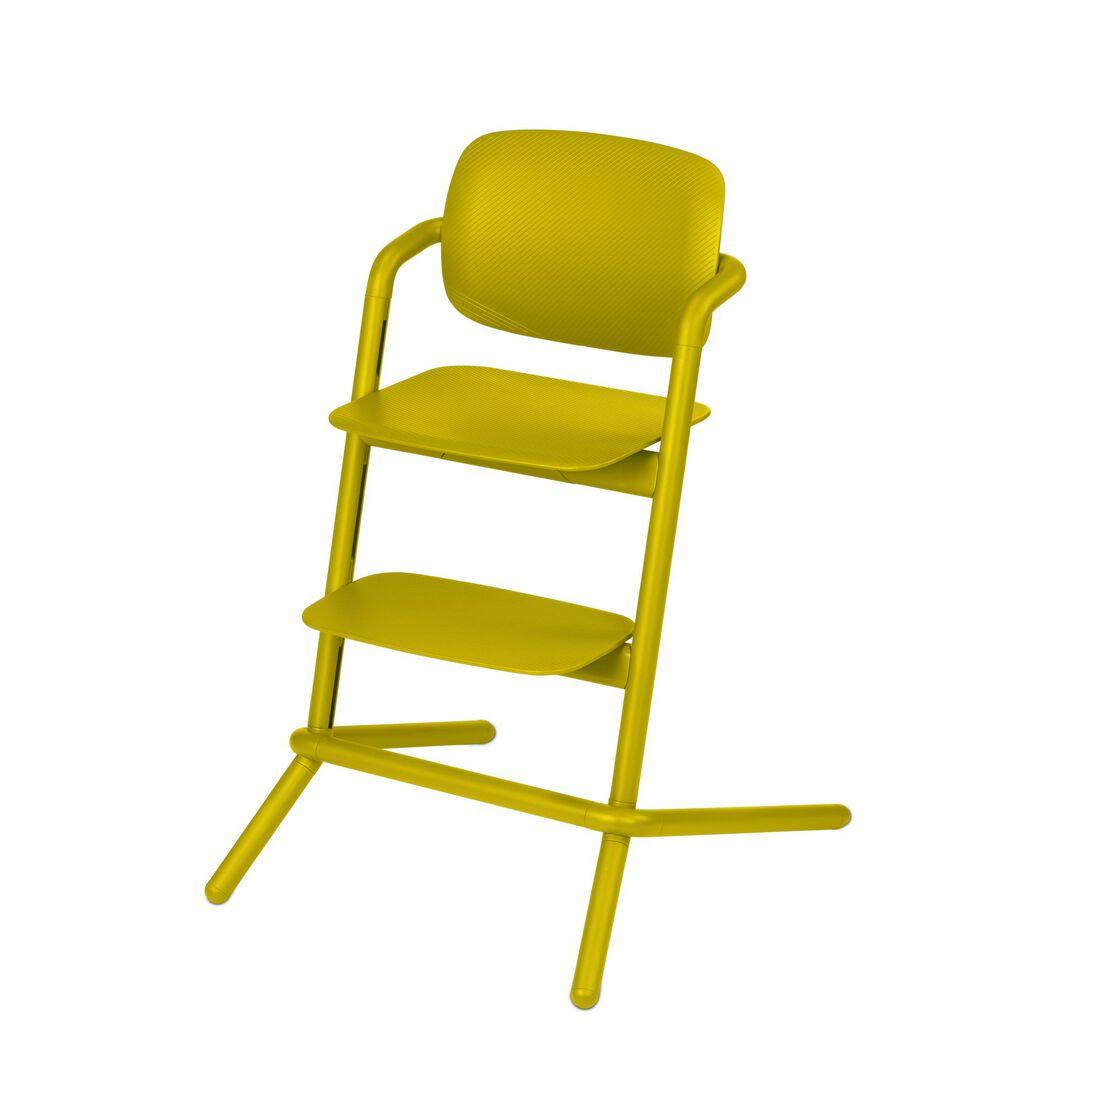 CYBEX Lemo Hochstuhl - Canary Yellow (Plastic) in Canary Yellow (Plastic) large Bild 1